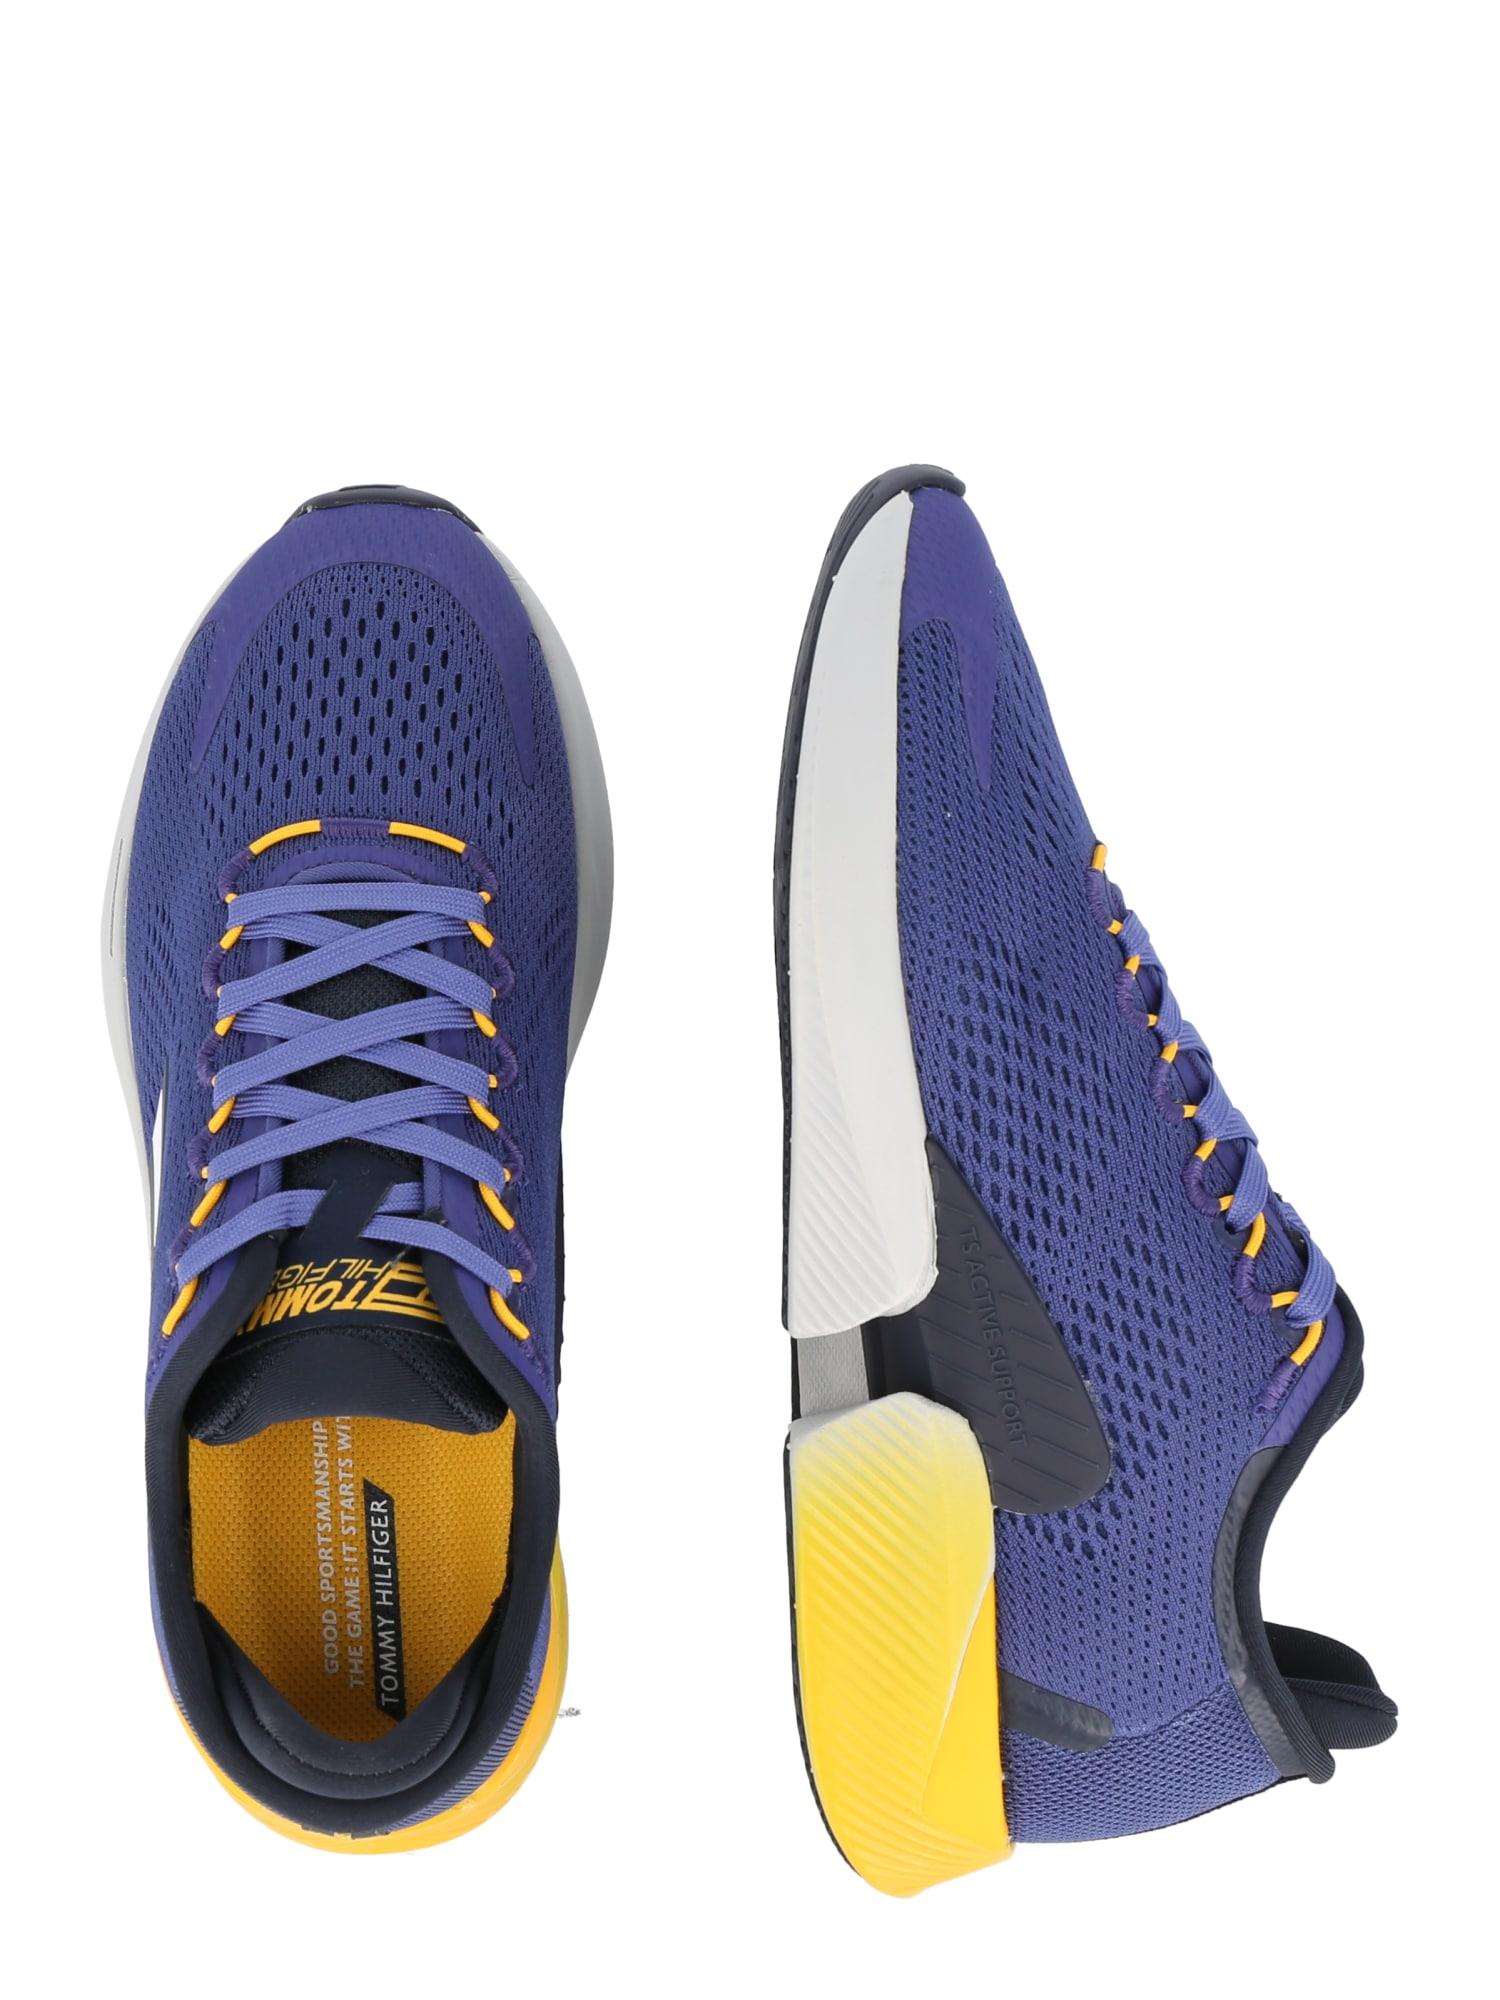 Tommy Sport Chaussure de sport  bleu / rouge / blanc / bleu foncé / jaune